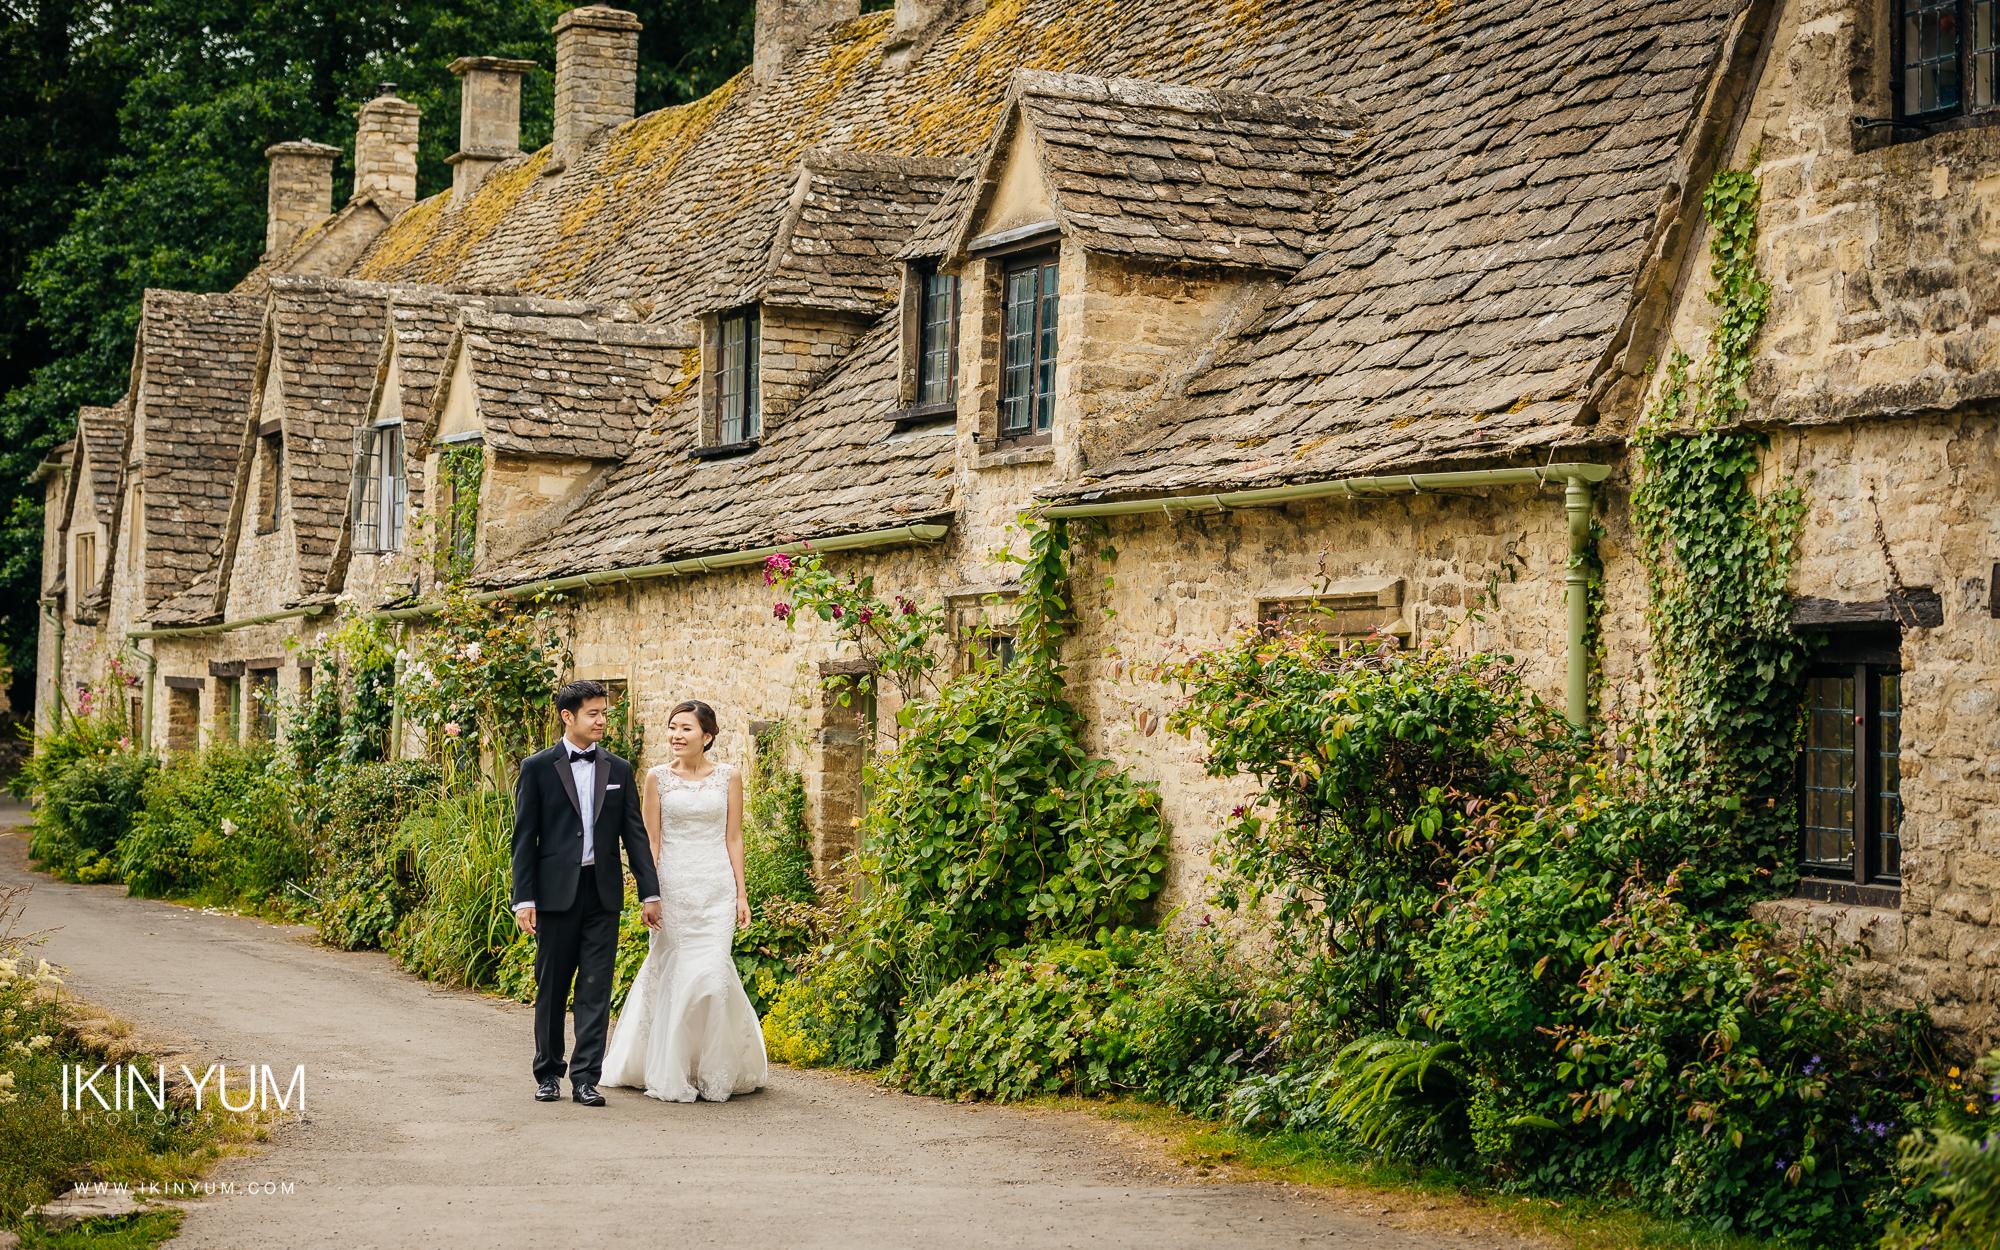 Carmen & Dennis Pre-Wedding Shoot - Ikin Yum Photography-018.jpg